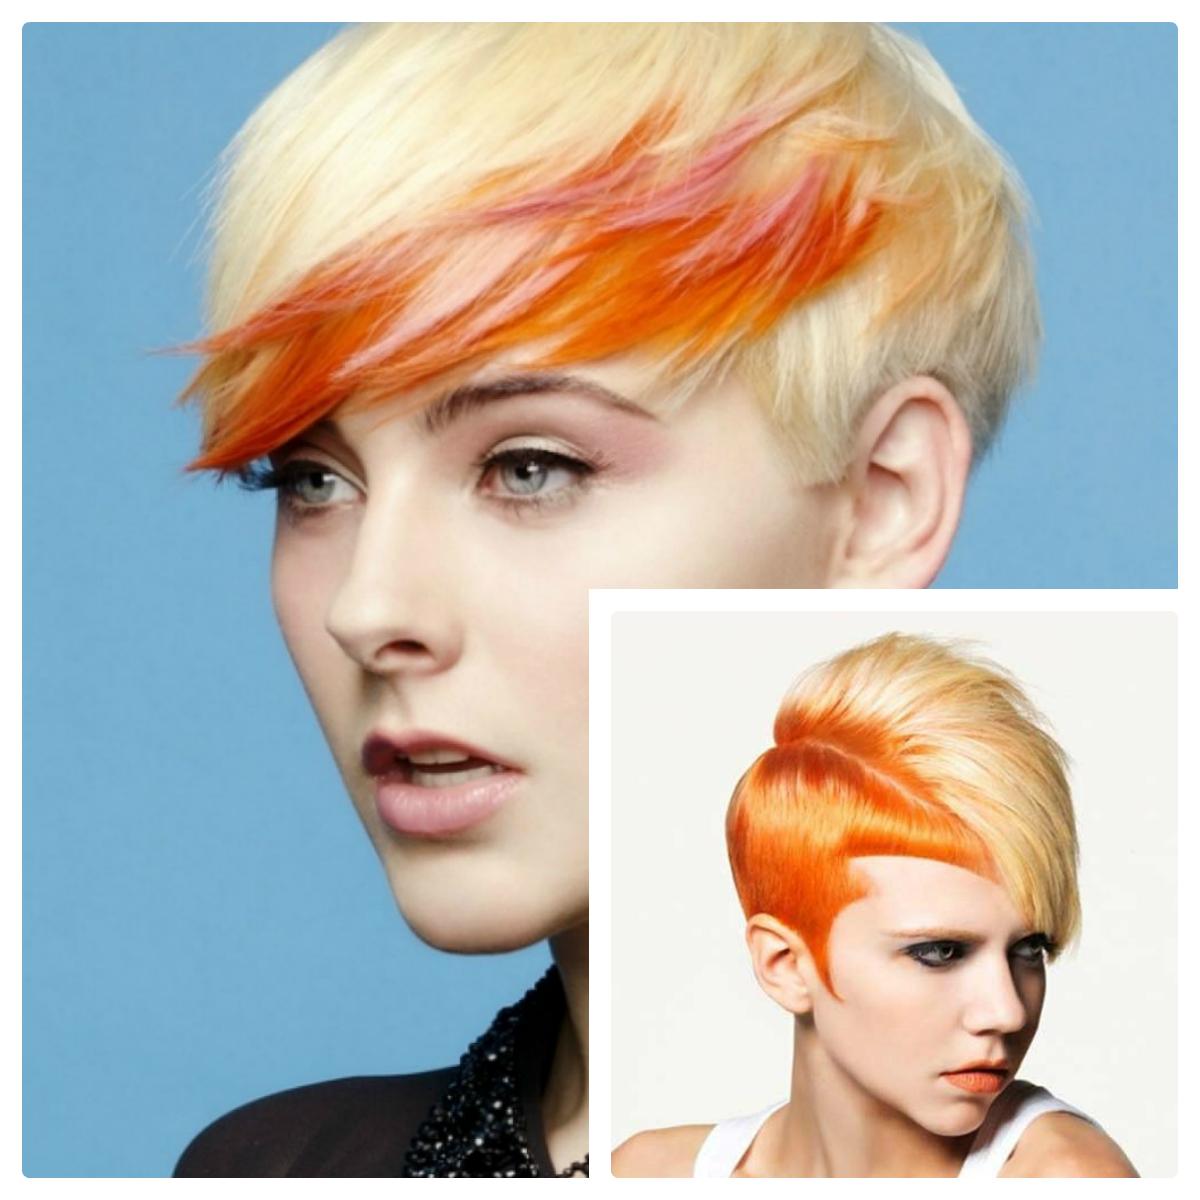 Подобрать прически и цвета волос онлайн